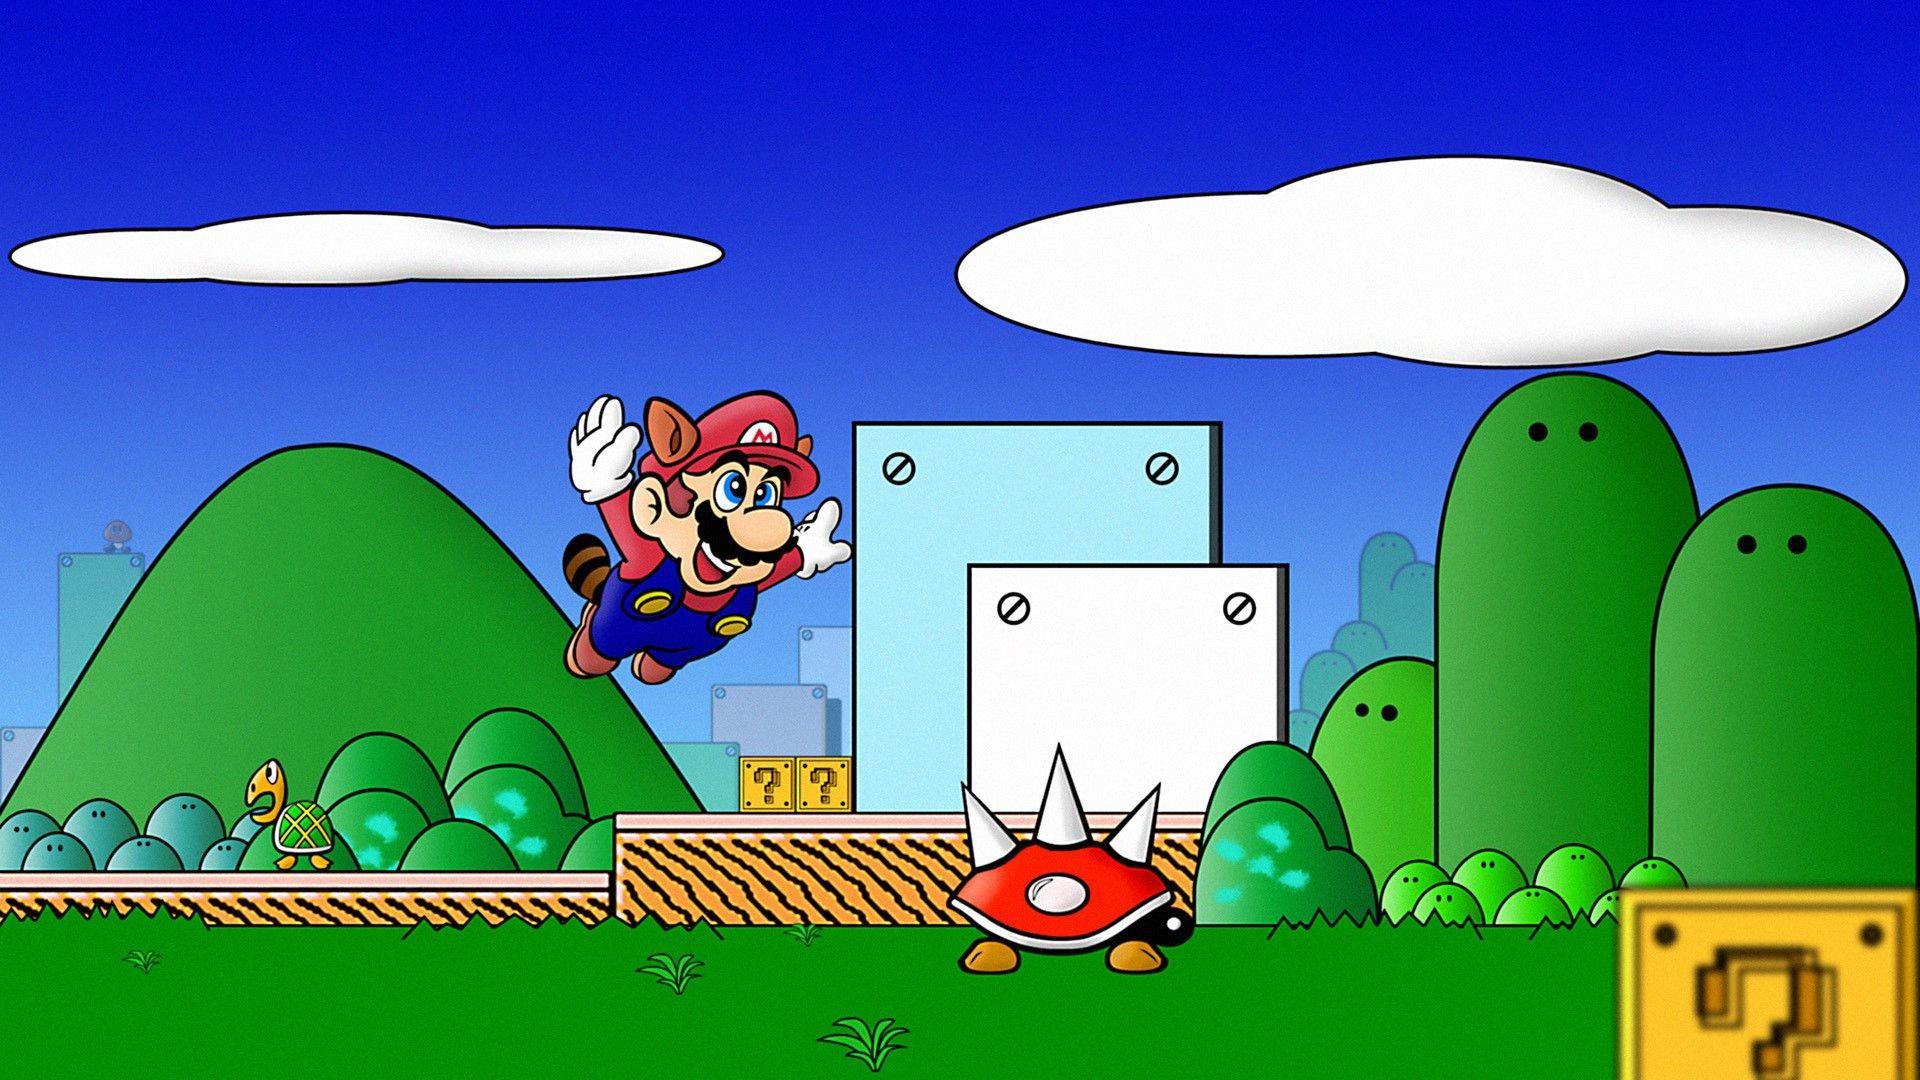 Supreme 3d Wallpaper Mario Bros Wallpapers 70 Images